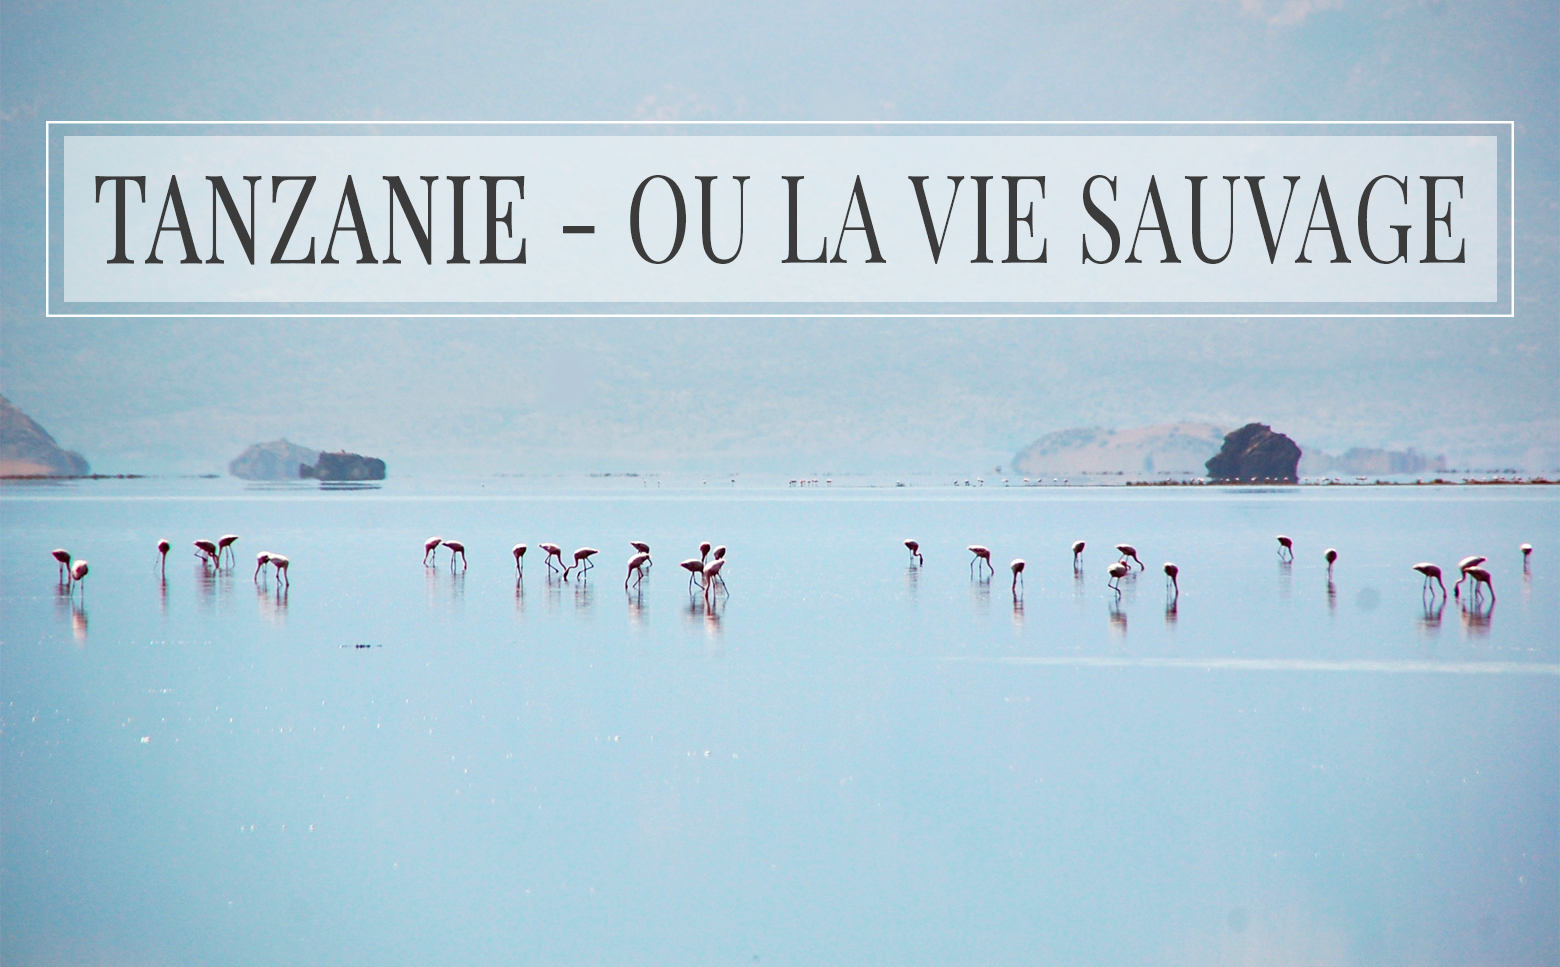 Tanzanie, ou la vie sauvage